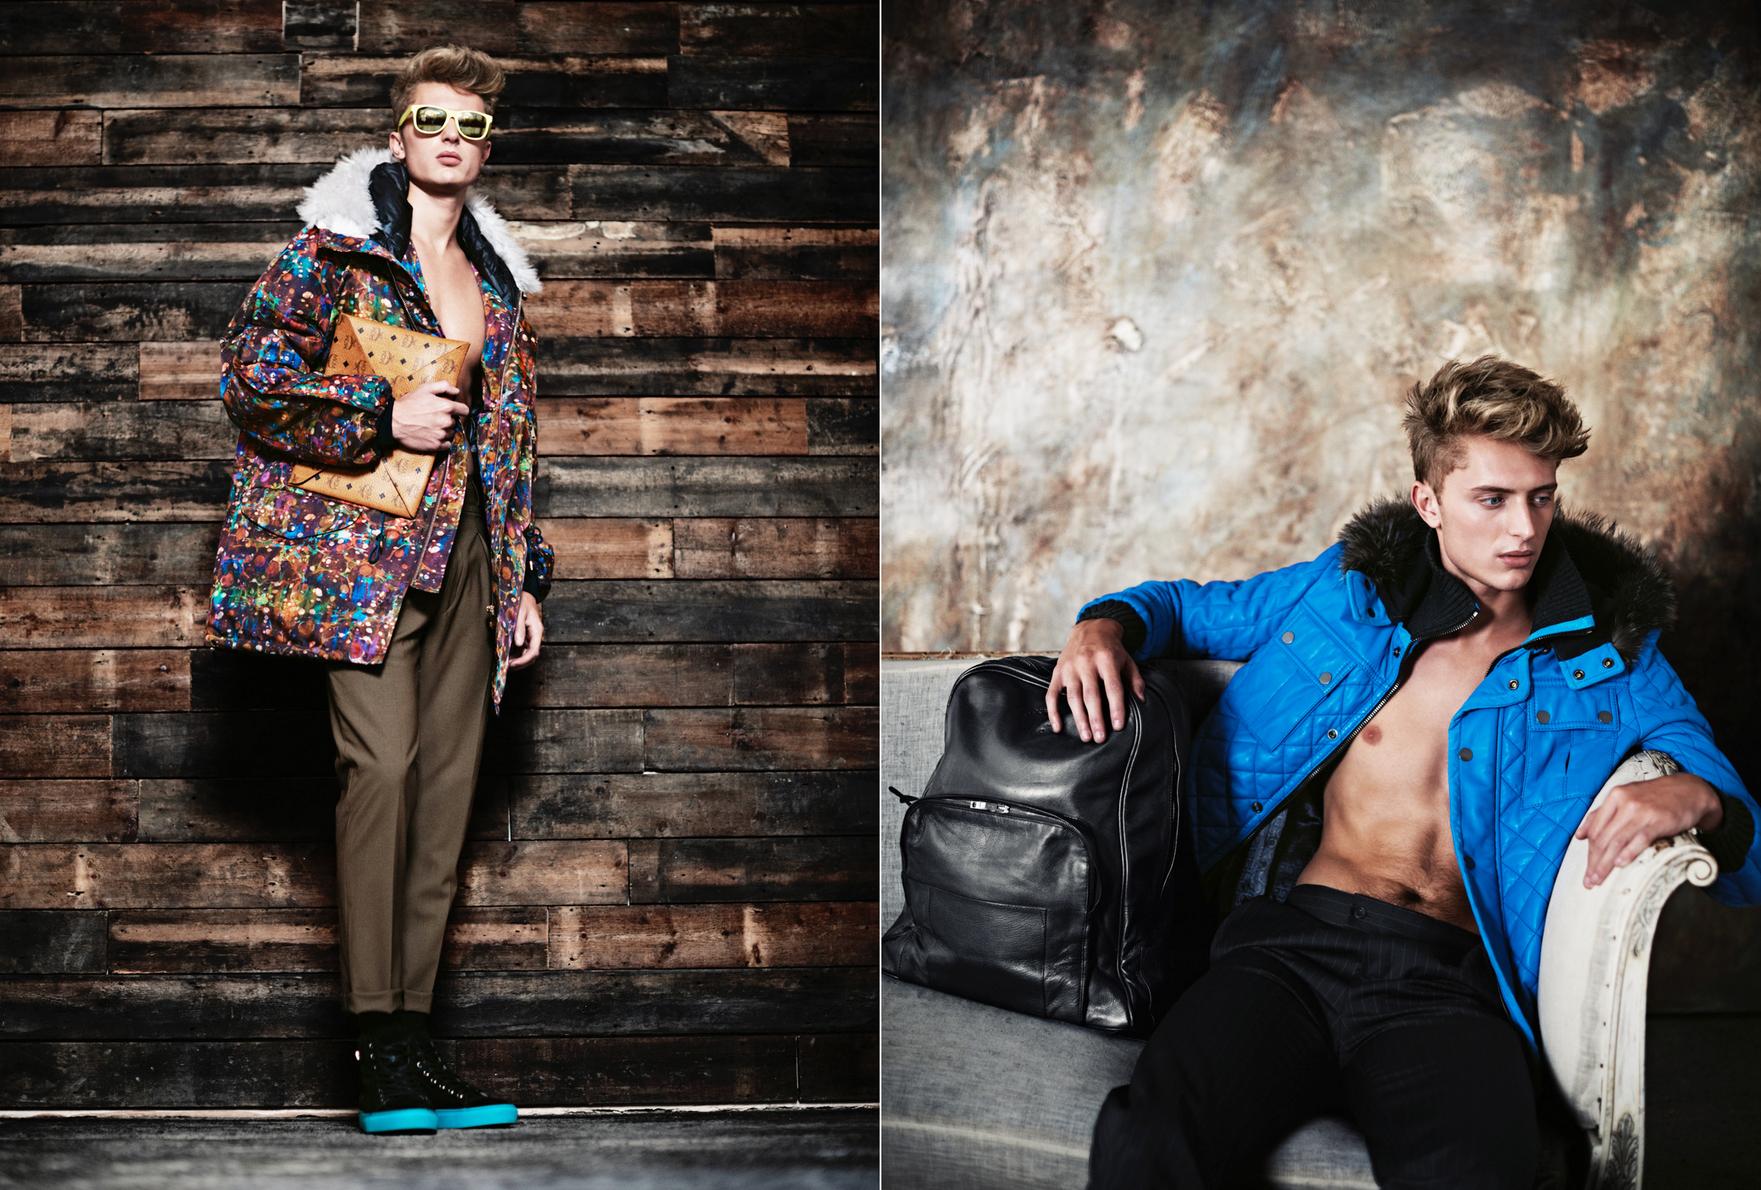 Helix Magazine, Photographers SIMON LIPMAN